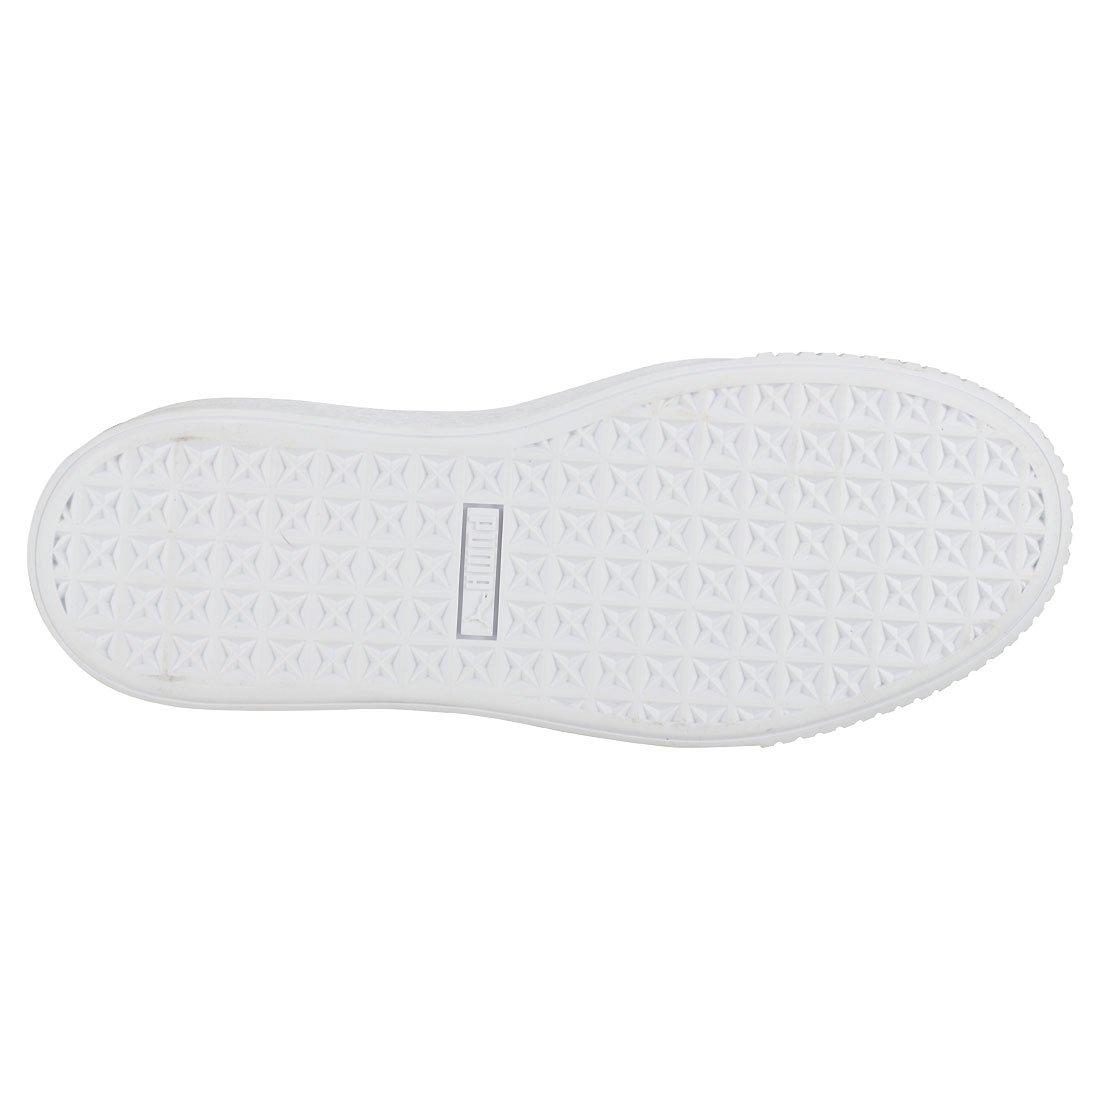 Puma Platform Sandal Wns Bianco Bianco Wns ef1b1e